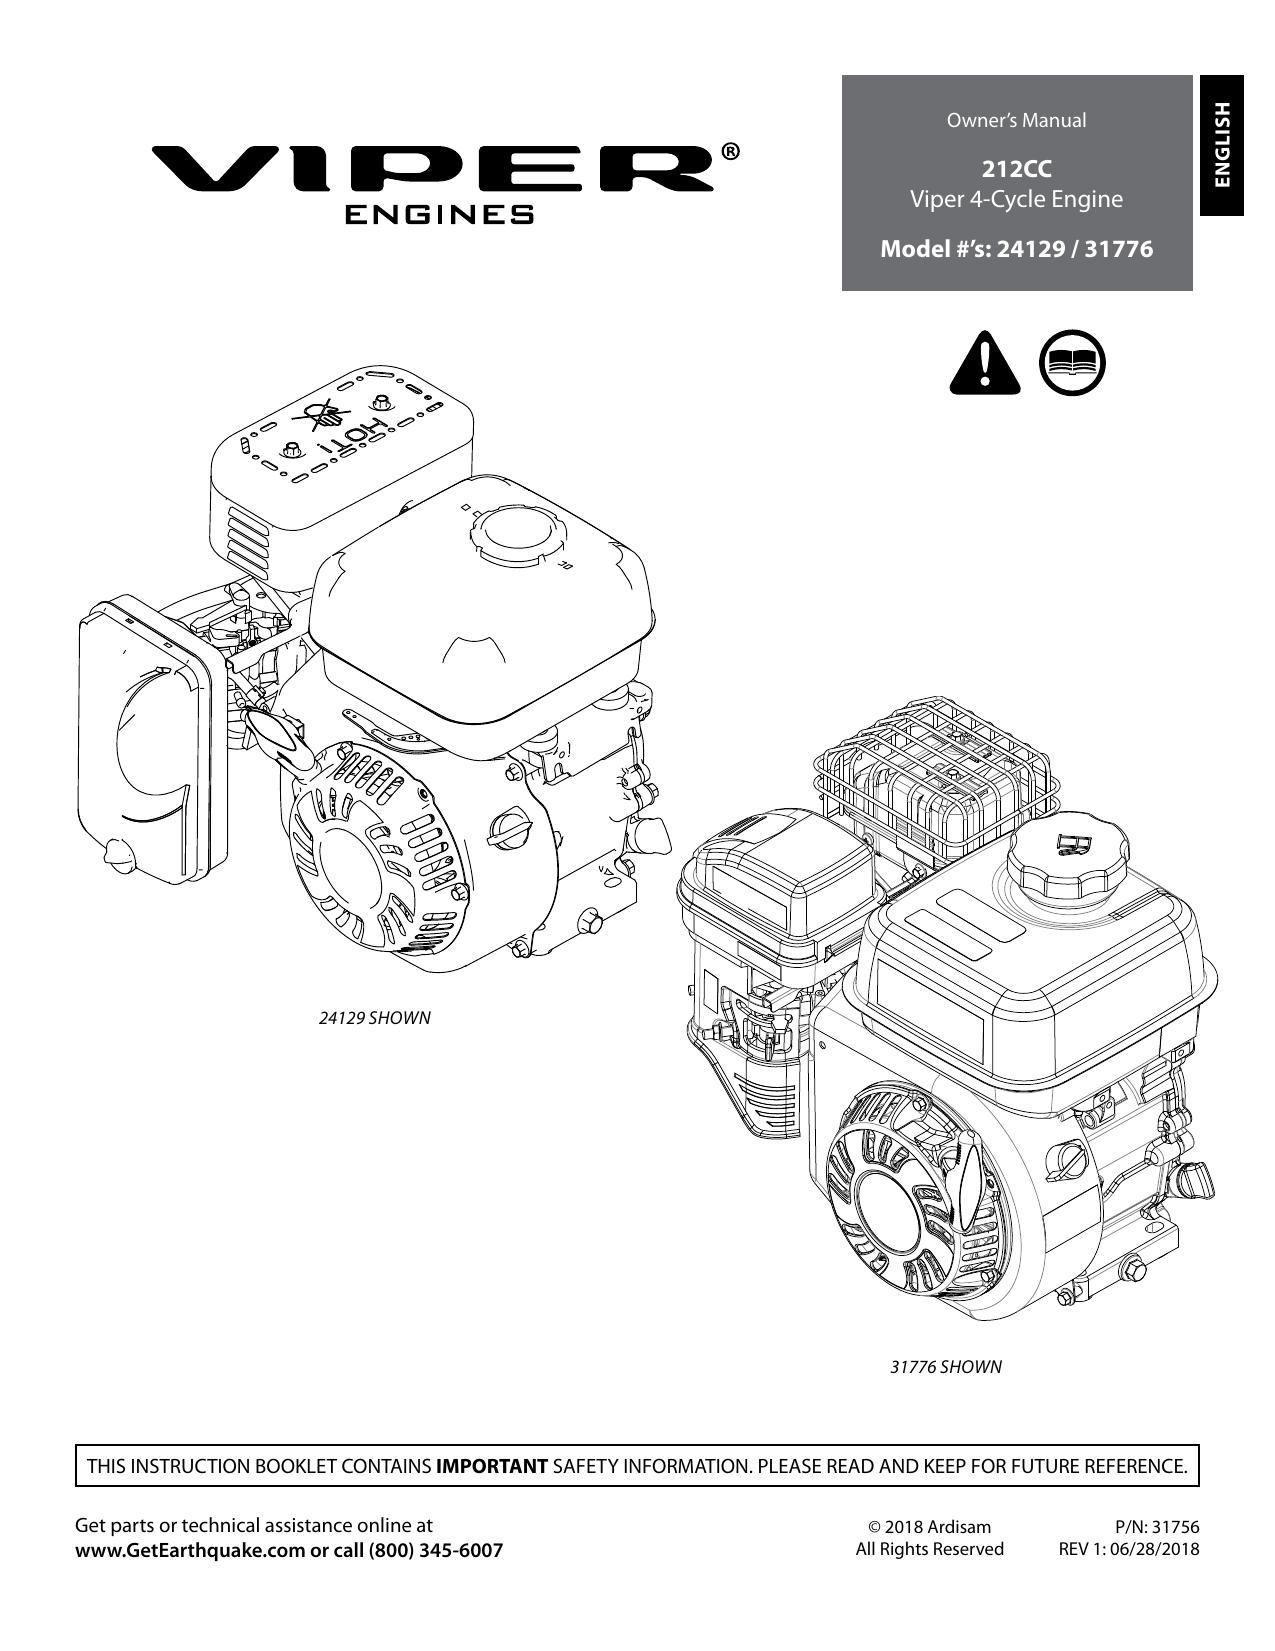 PERFORMANCE CARBURETOR FOR EARTHQUAKE CHIPPER SHREDDER VIPER ENGINE MOTOR 196CC